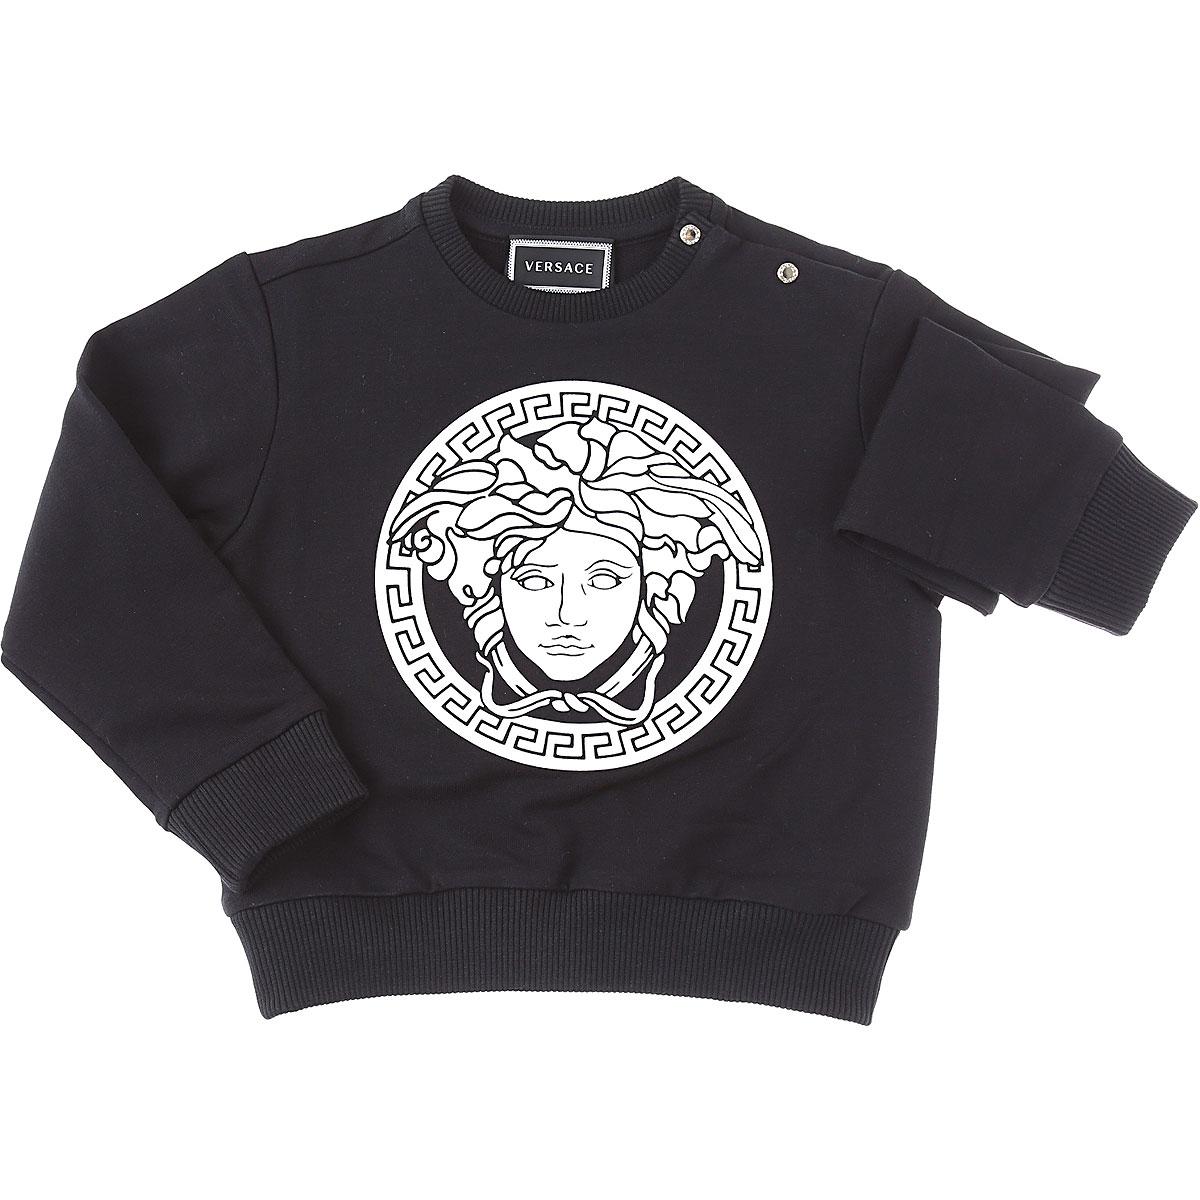 Versace Baby Sweatshirts & Hoodies for Boys On Sale, White, Cotton, 2019, 12 M 18M 24M